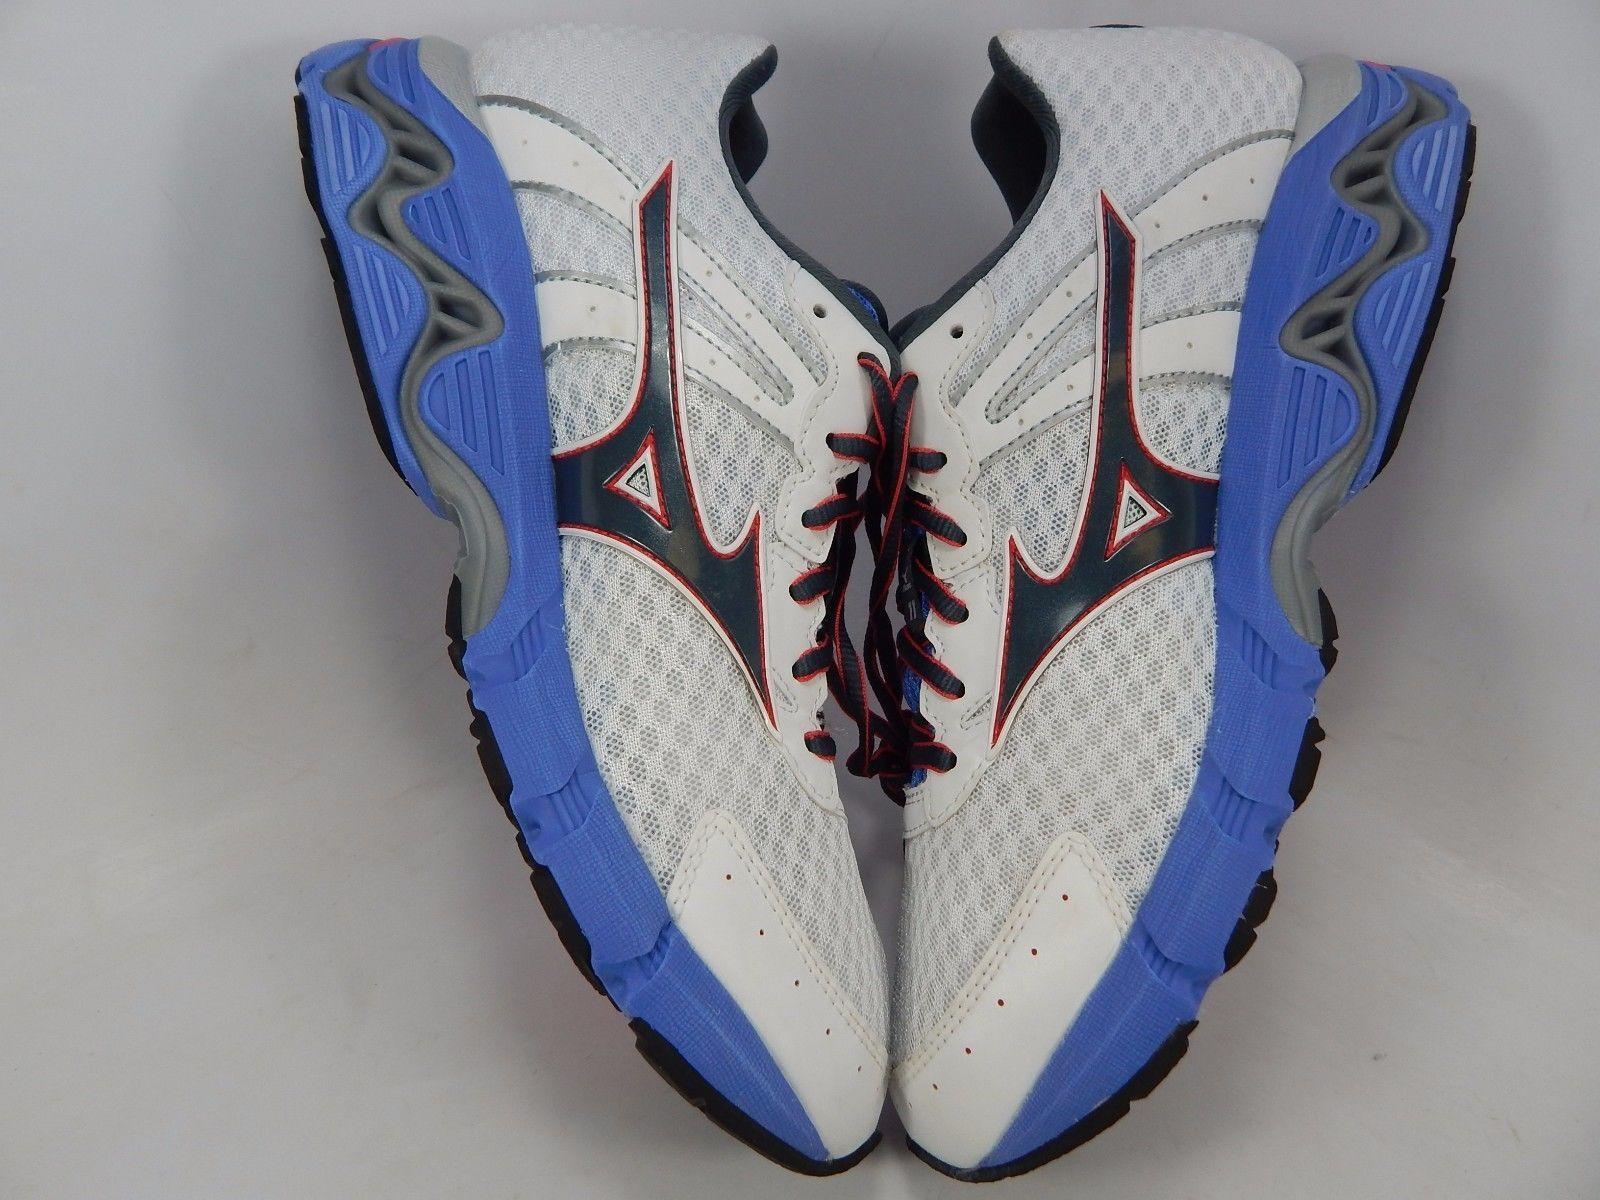 Mizuno Wave Inspire 11 Women's Running Shoes Size US 10 M (B) EU 41 White Purple